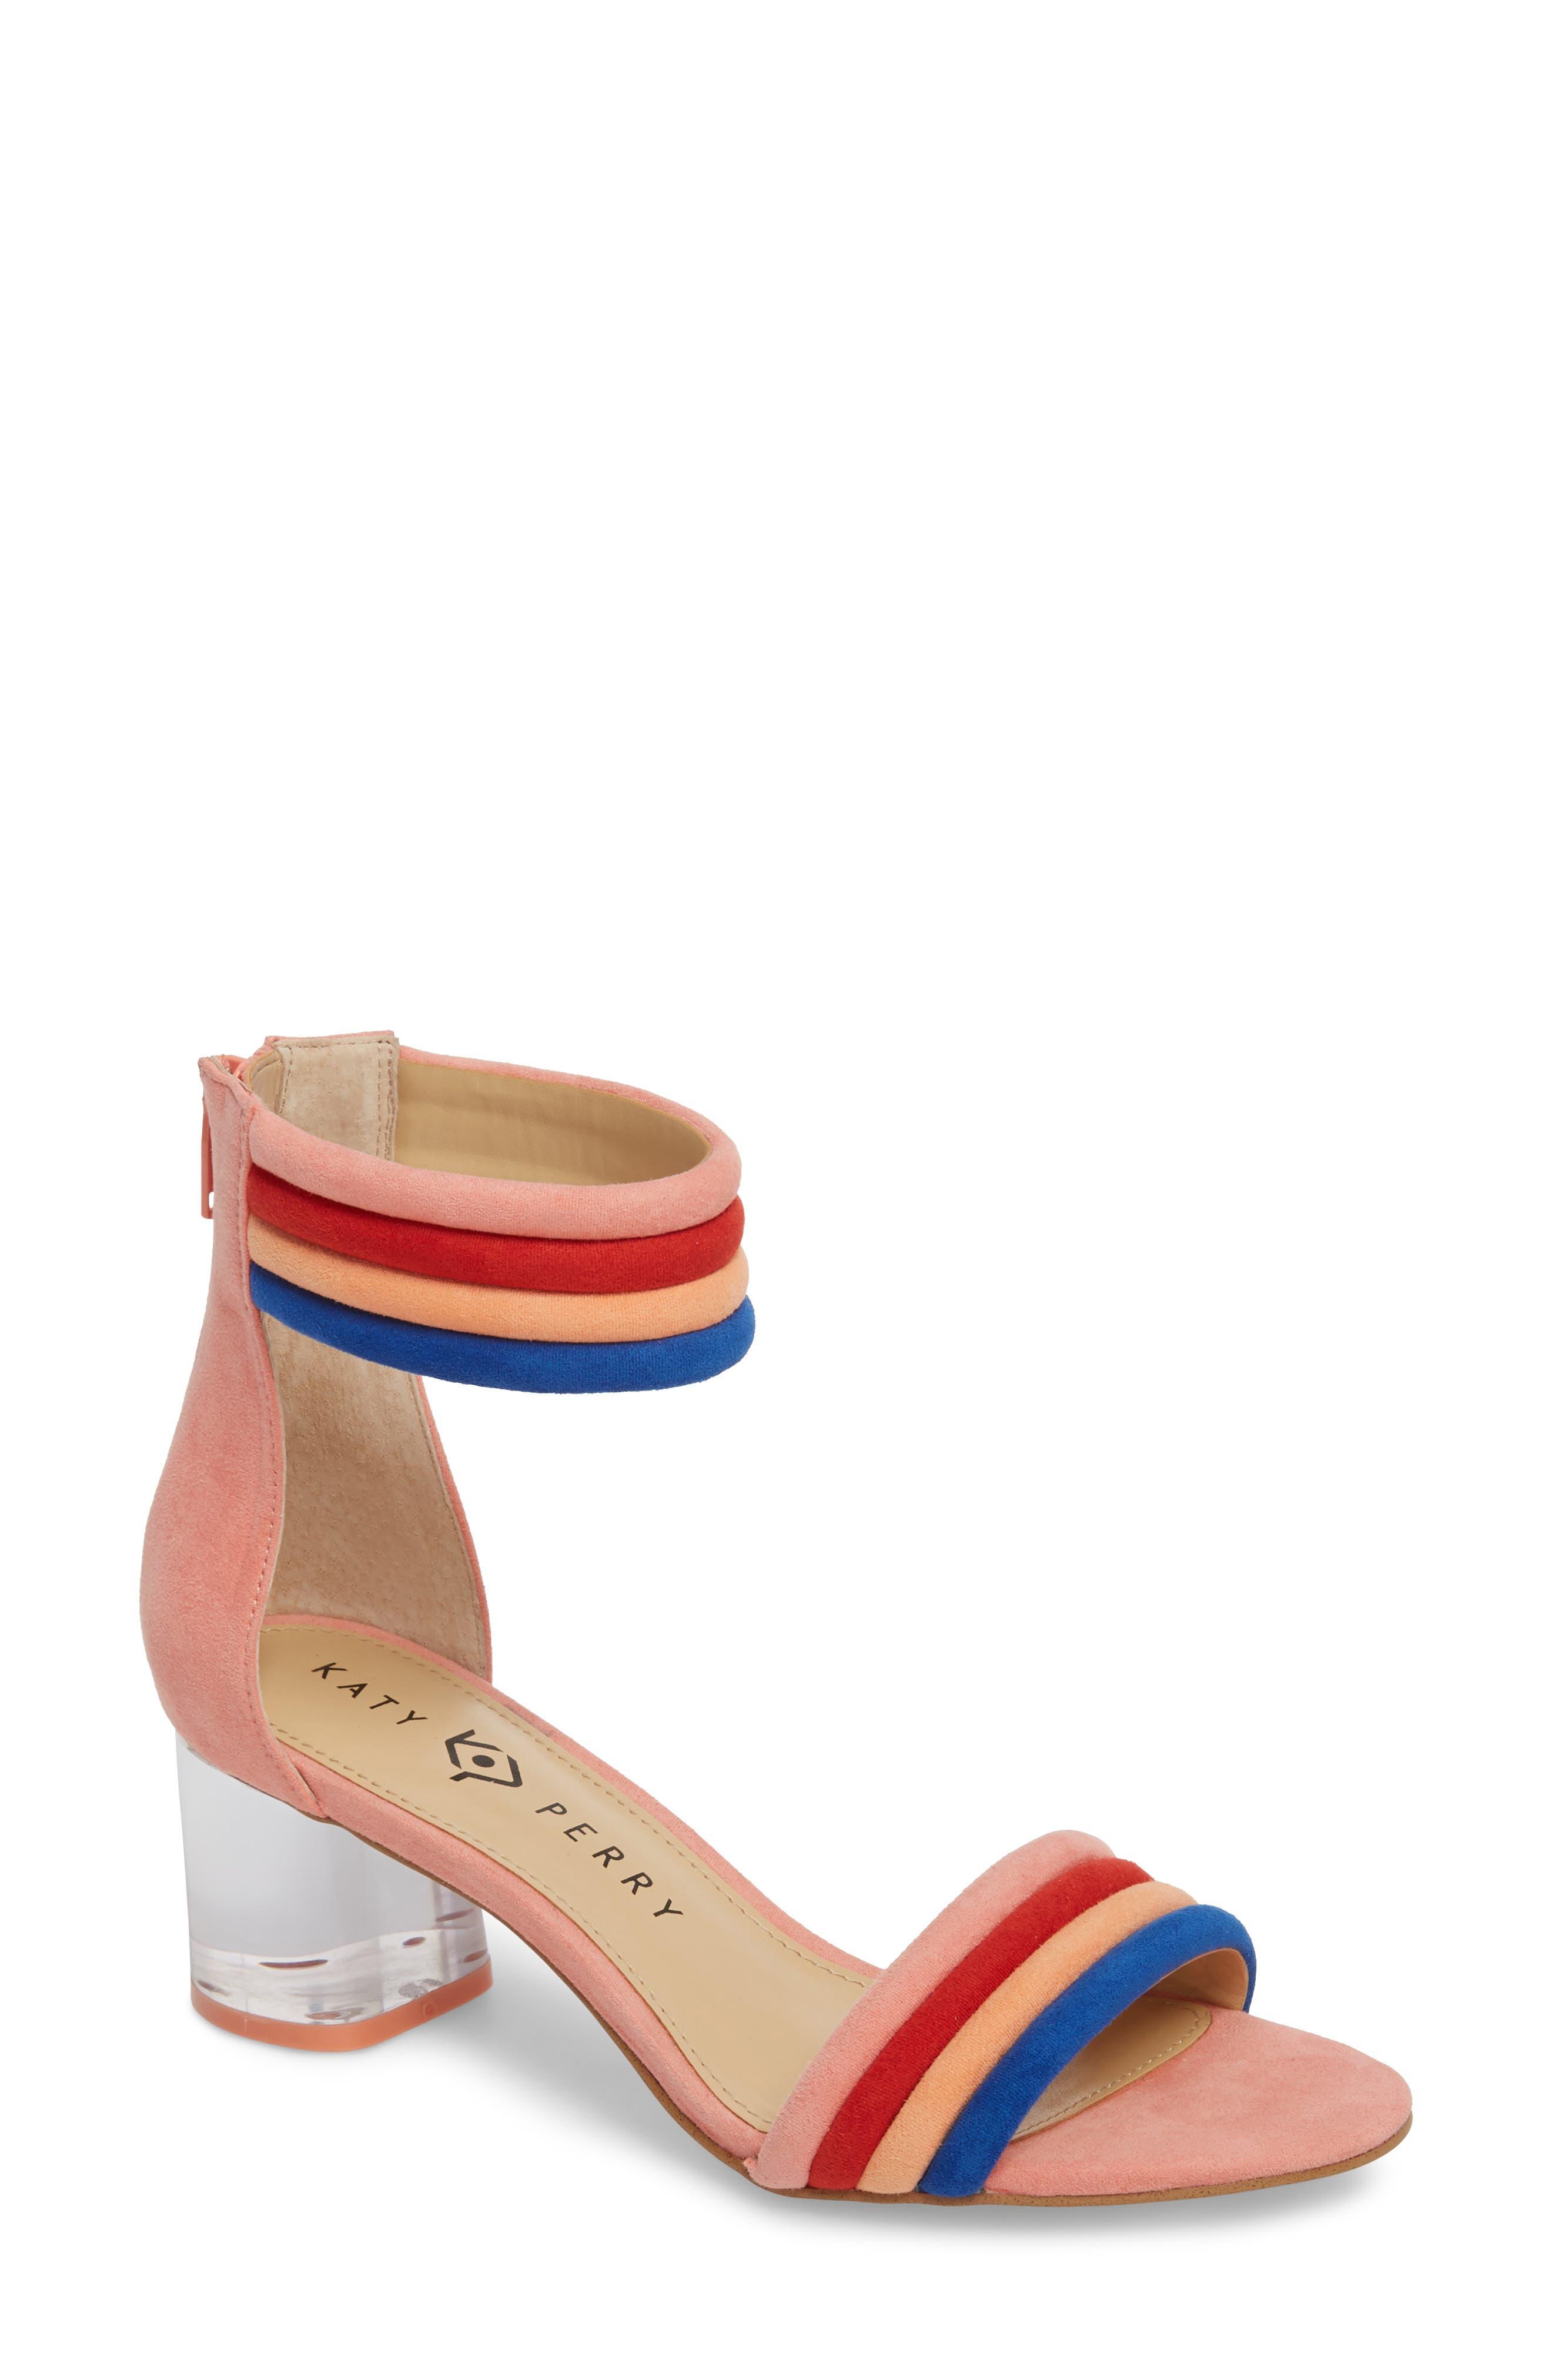 Tube Strap Sandal,                         Main,                         color, Pop Pink Suede